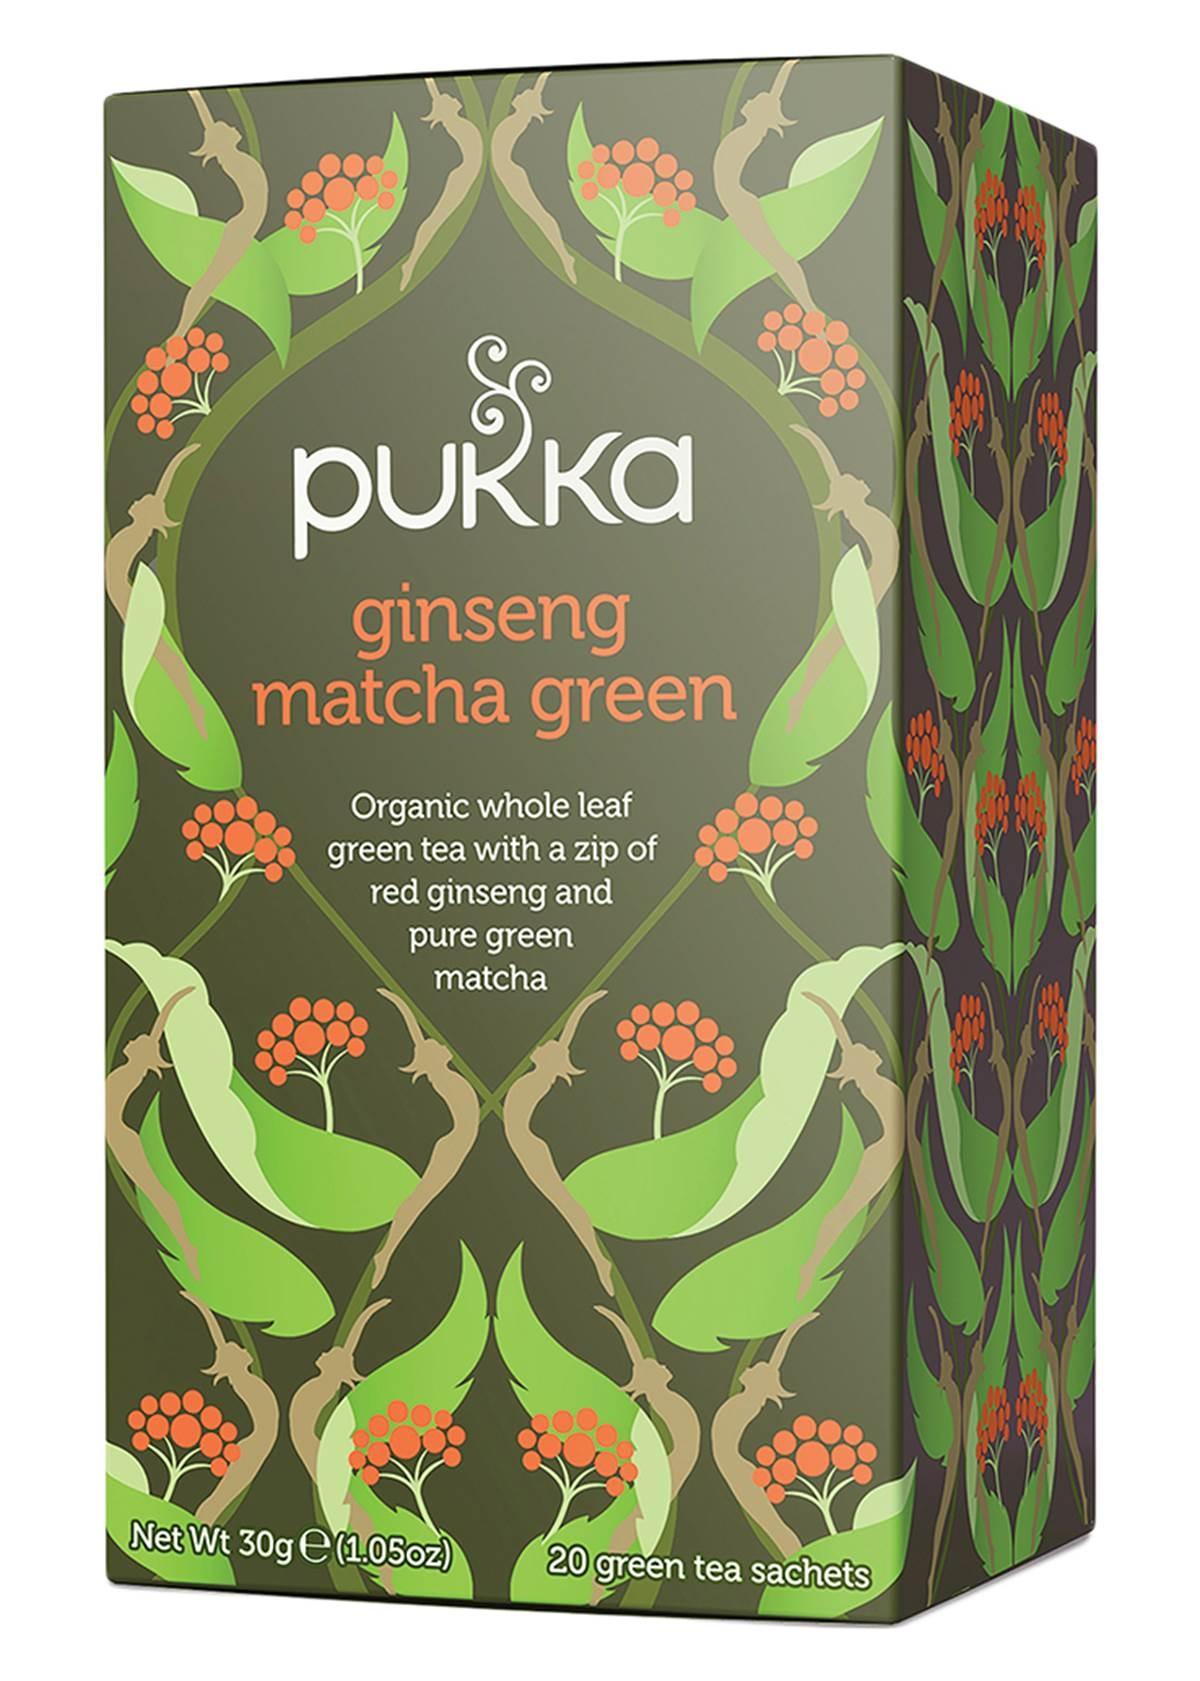 Pukka Ginseng Matcha Green Tea x 20 teabags